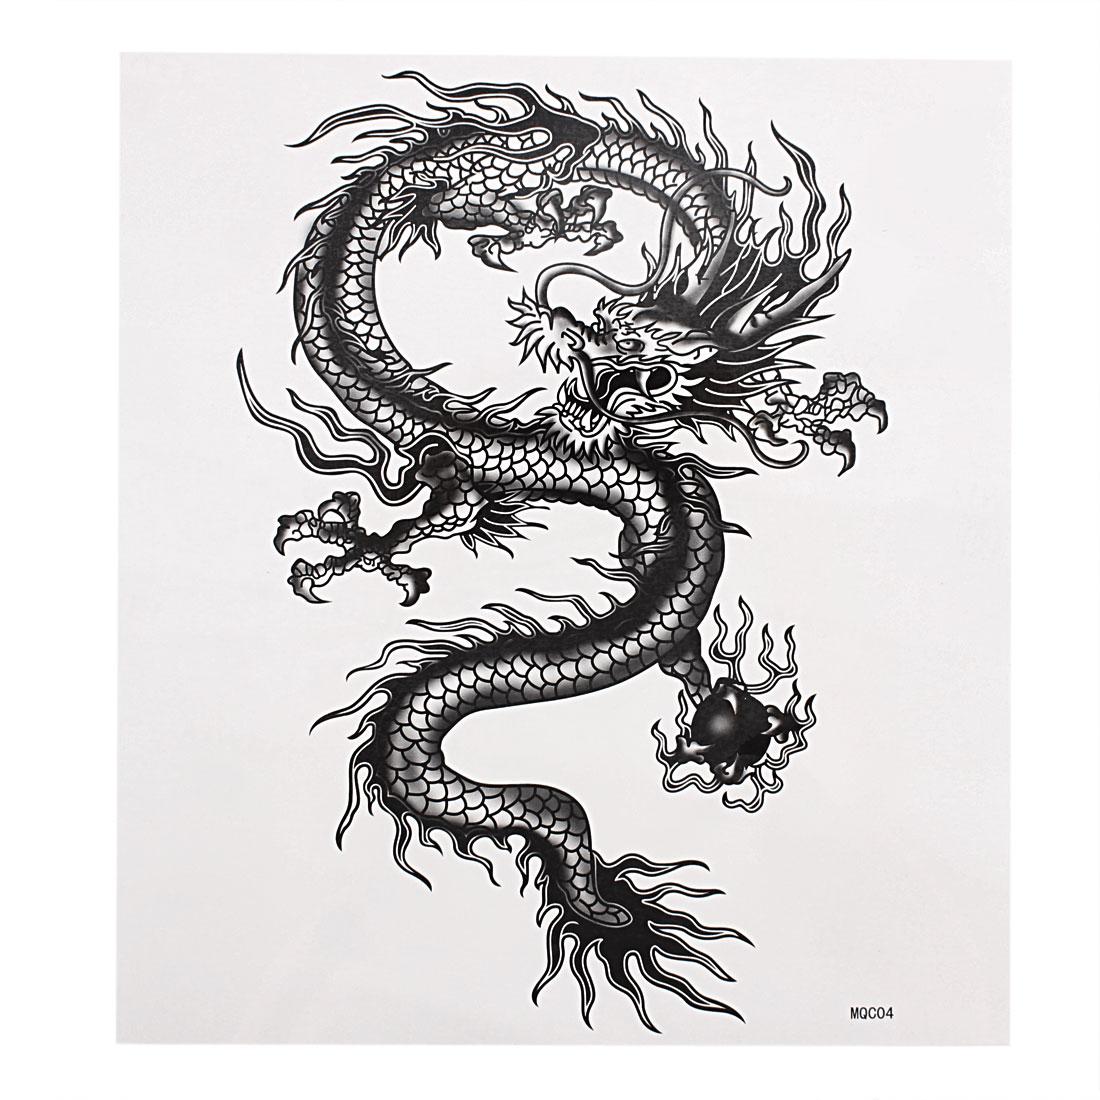 Dragon Printed Body Art Sticker Temporary Tattoo Black White